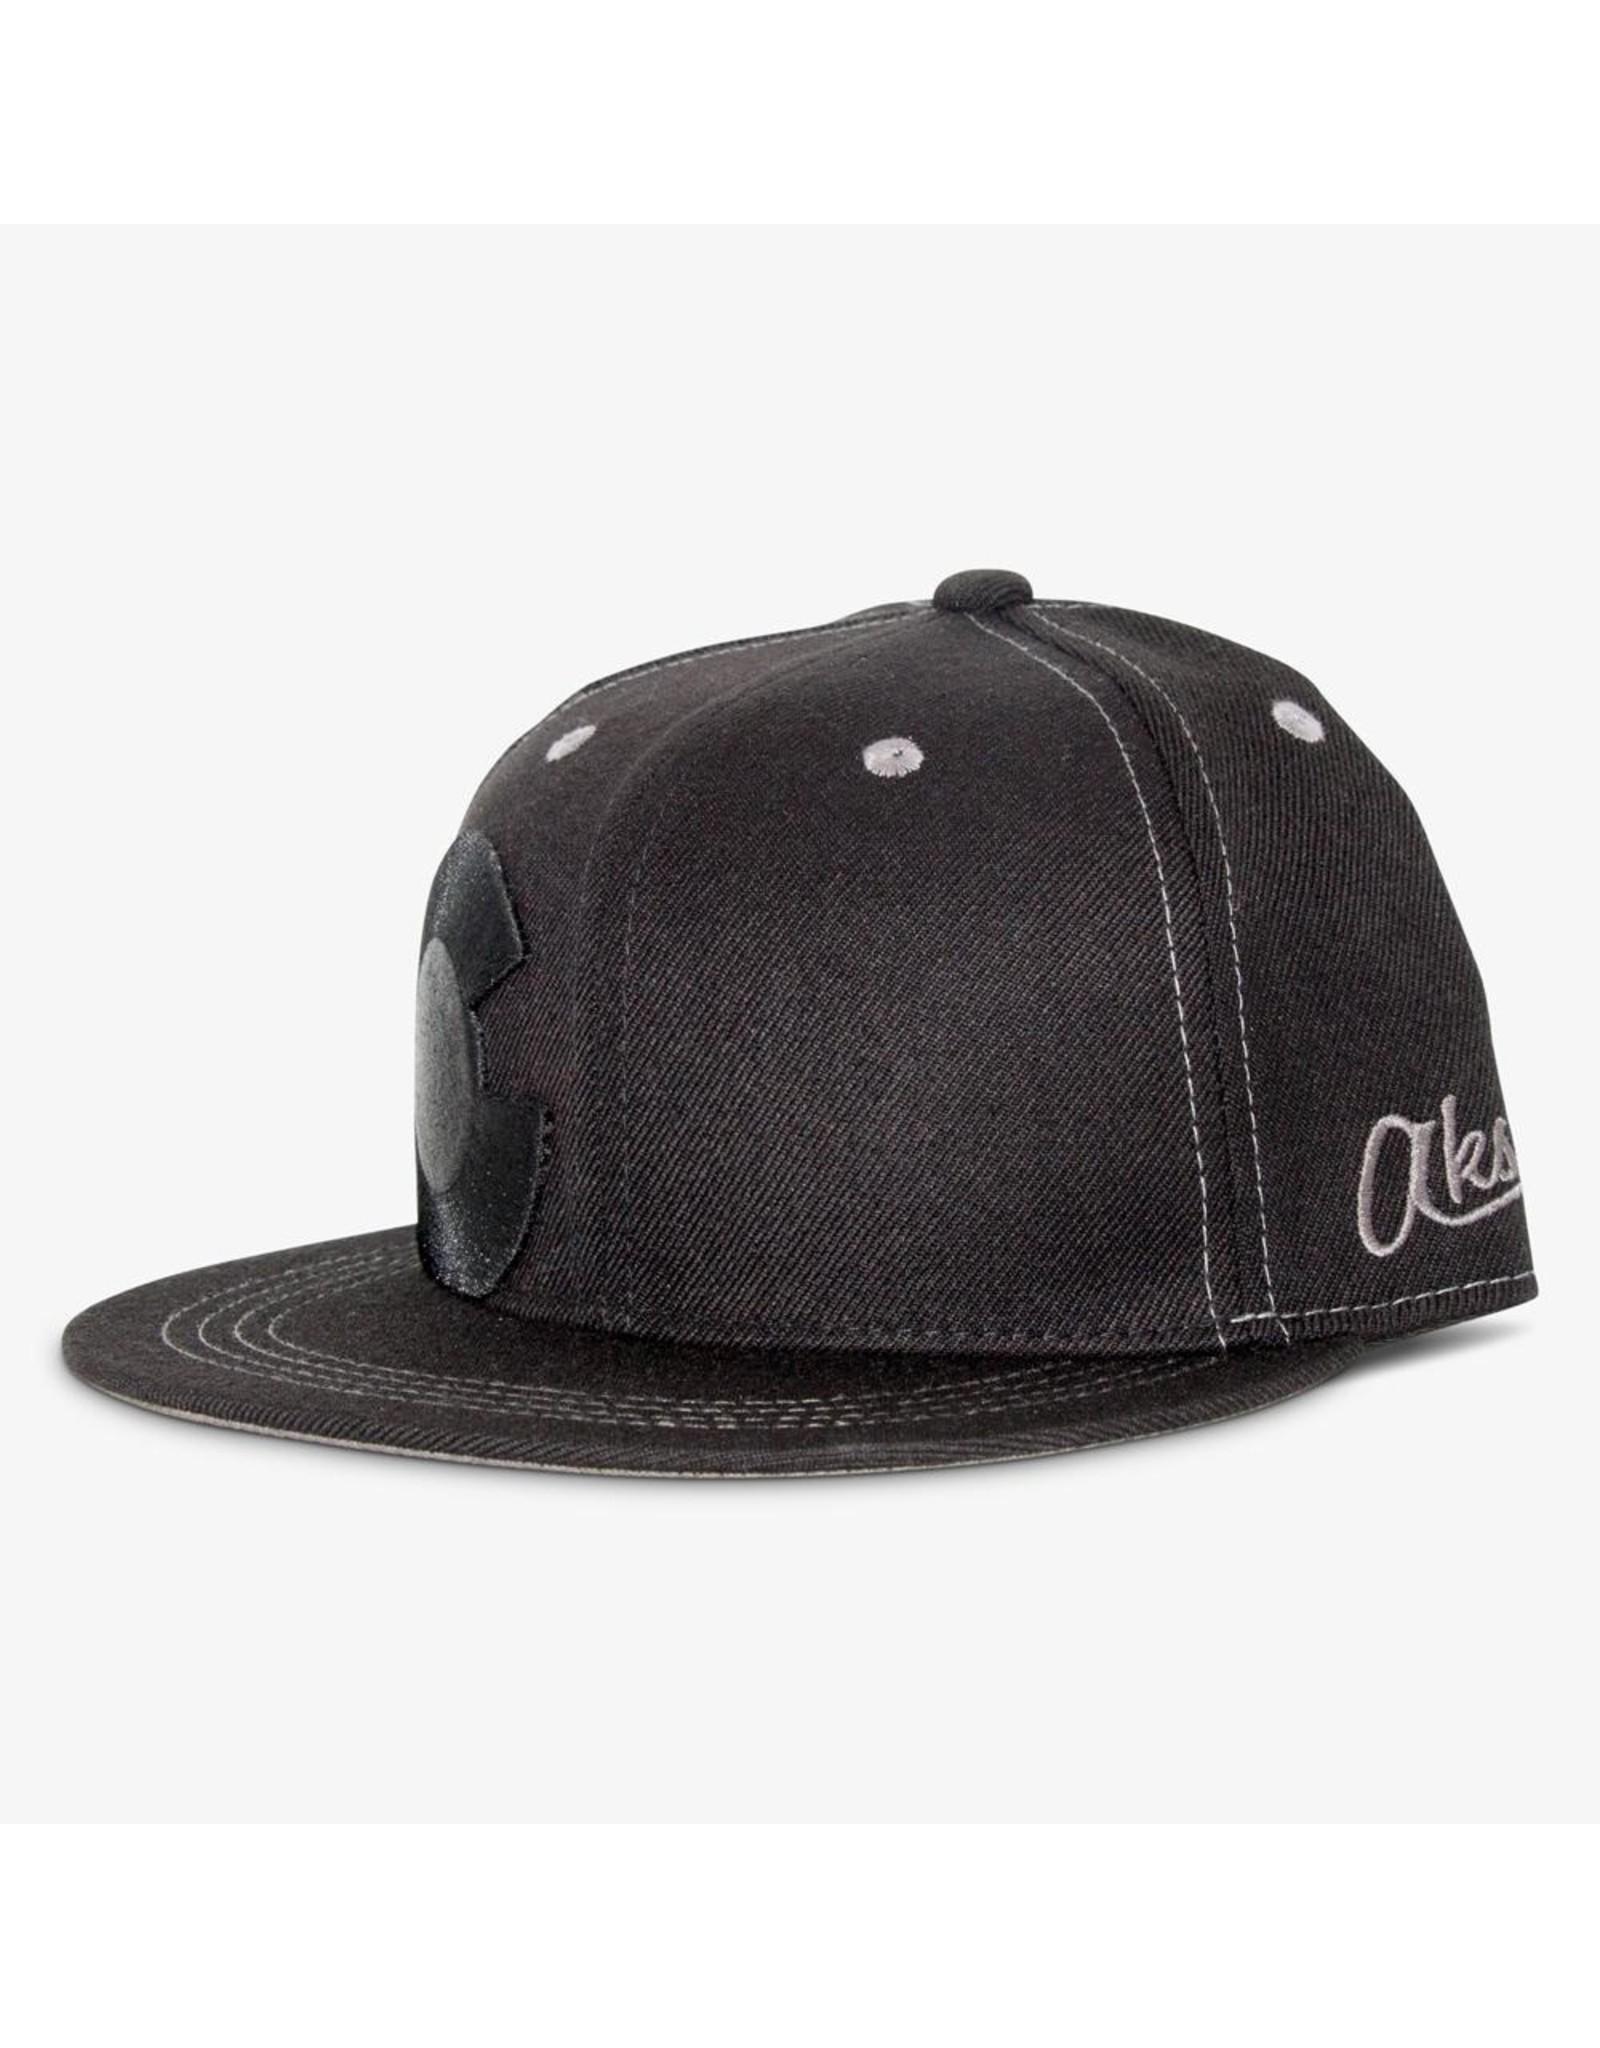 Aksels Aksels Colorado Big C Lined Snapback Hat